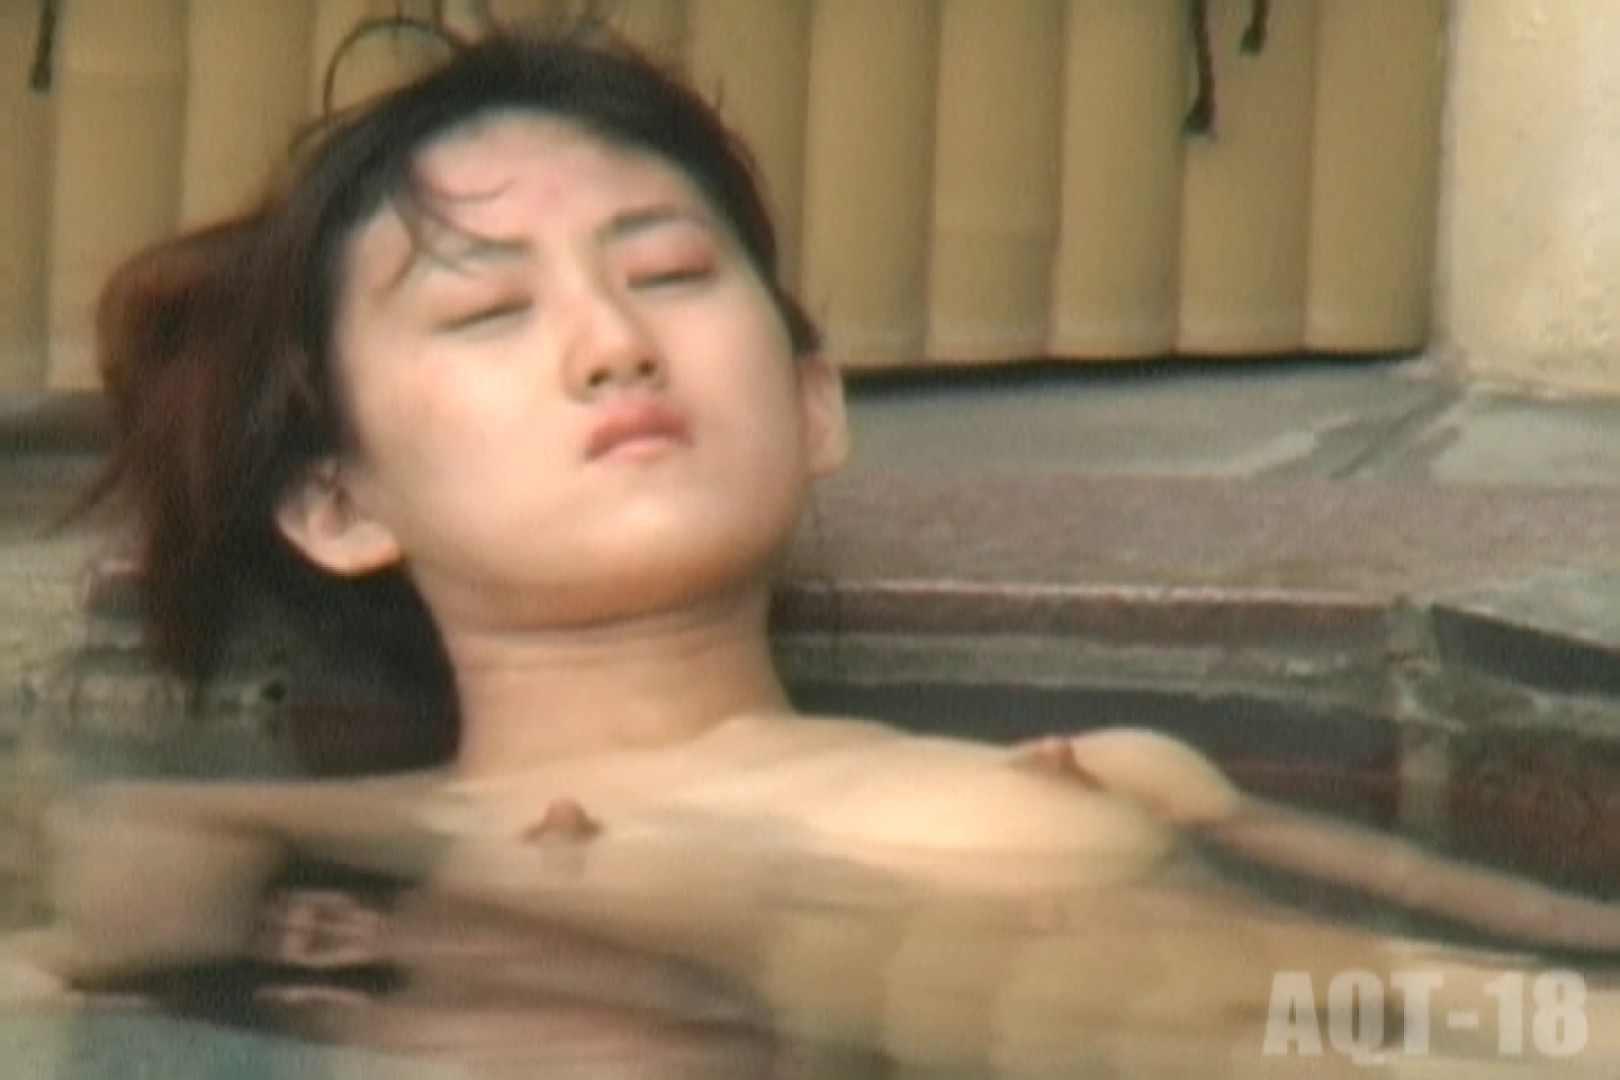 Aquaな露天風呂Vol.862 美しいOLの裸体 戯れ無修正画像 99pic 71